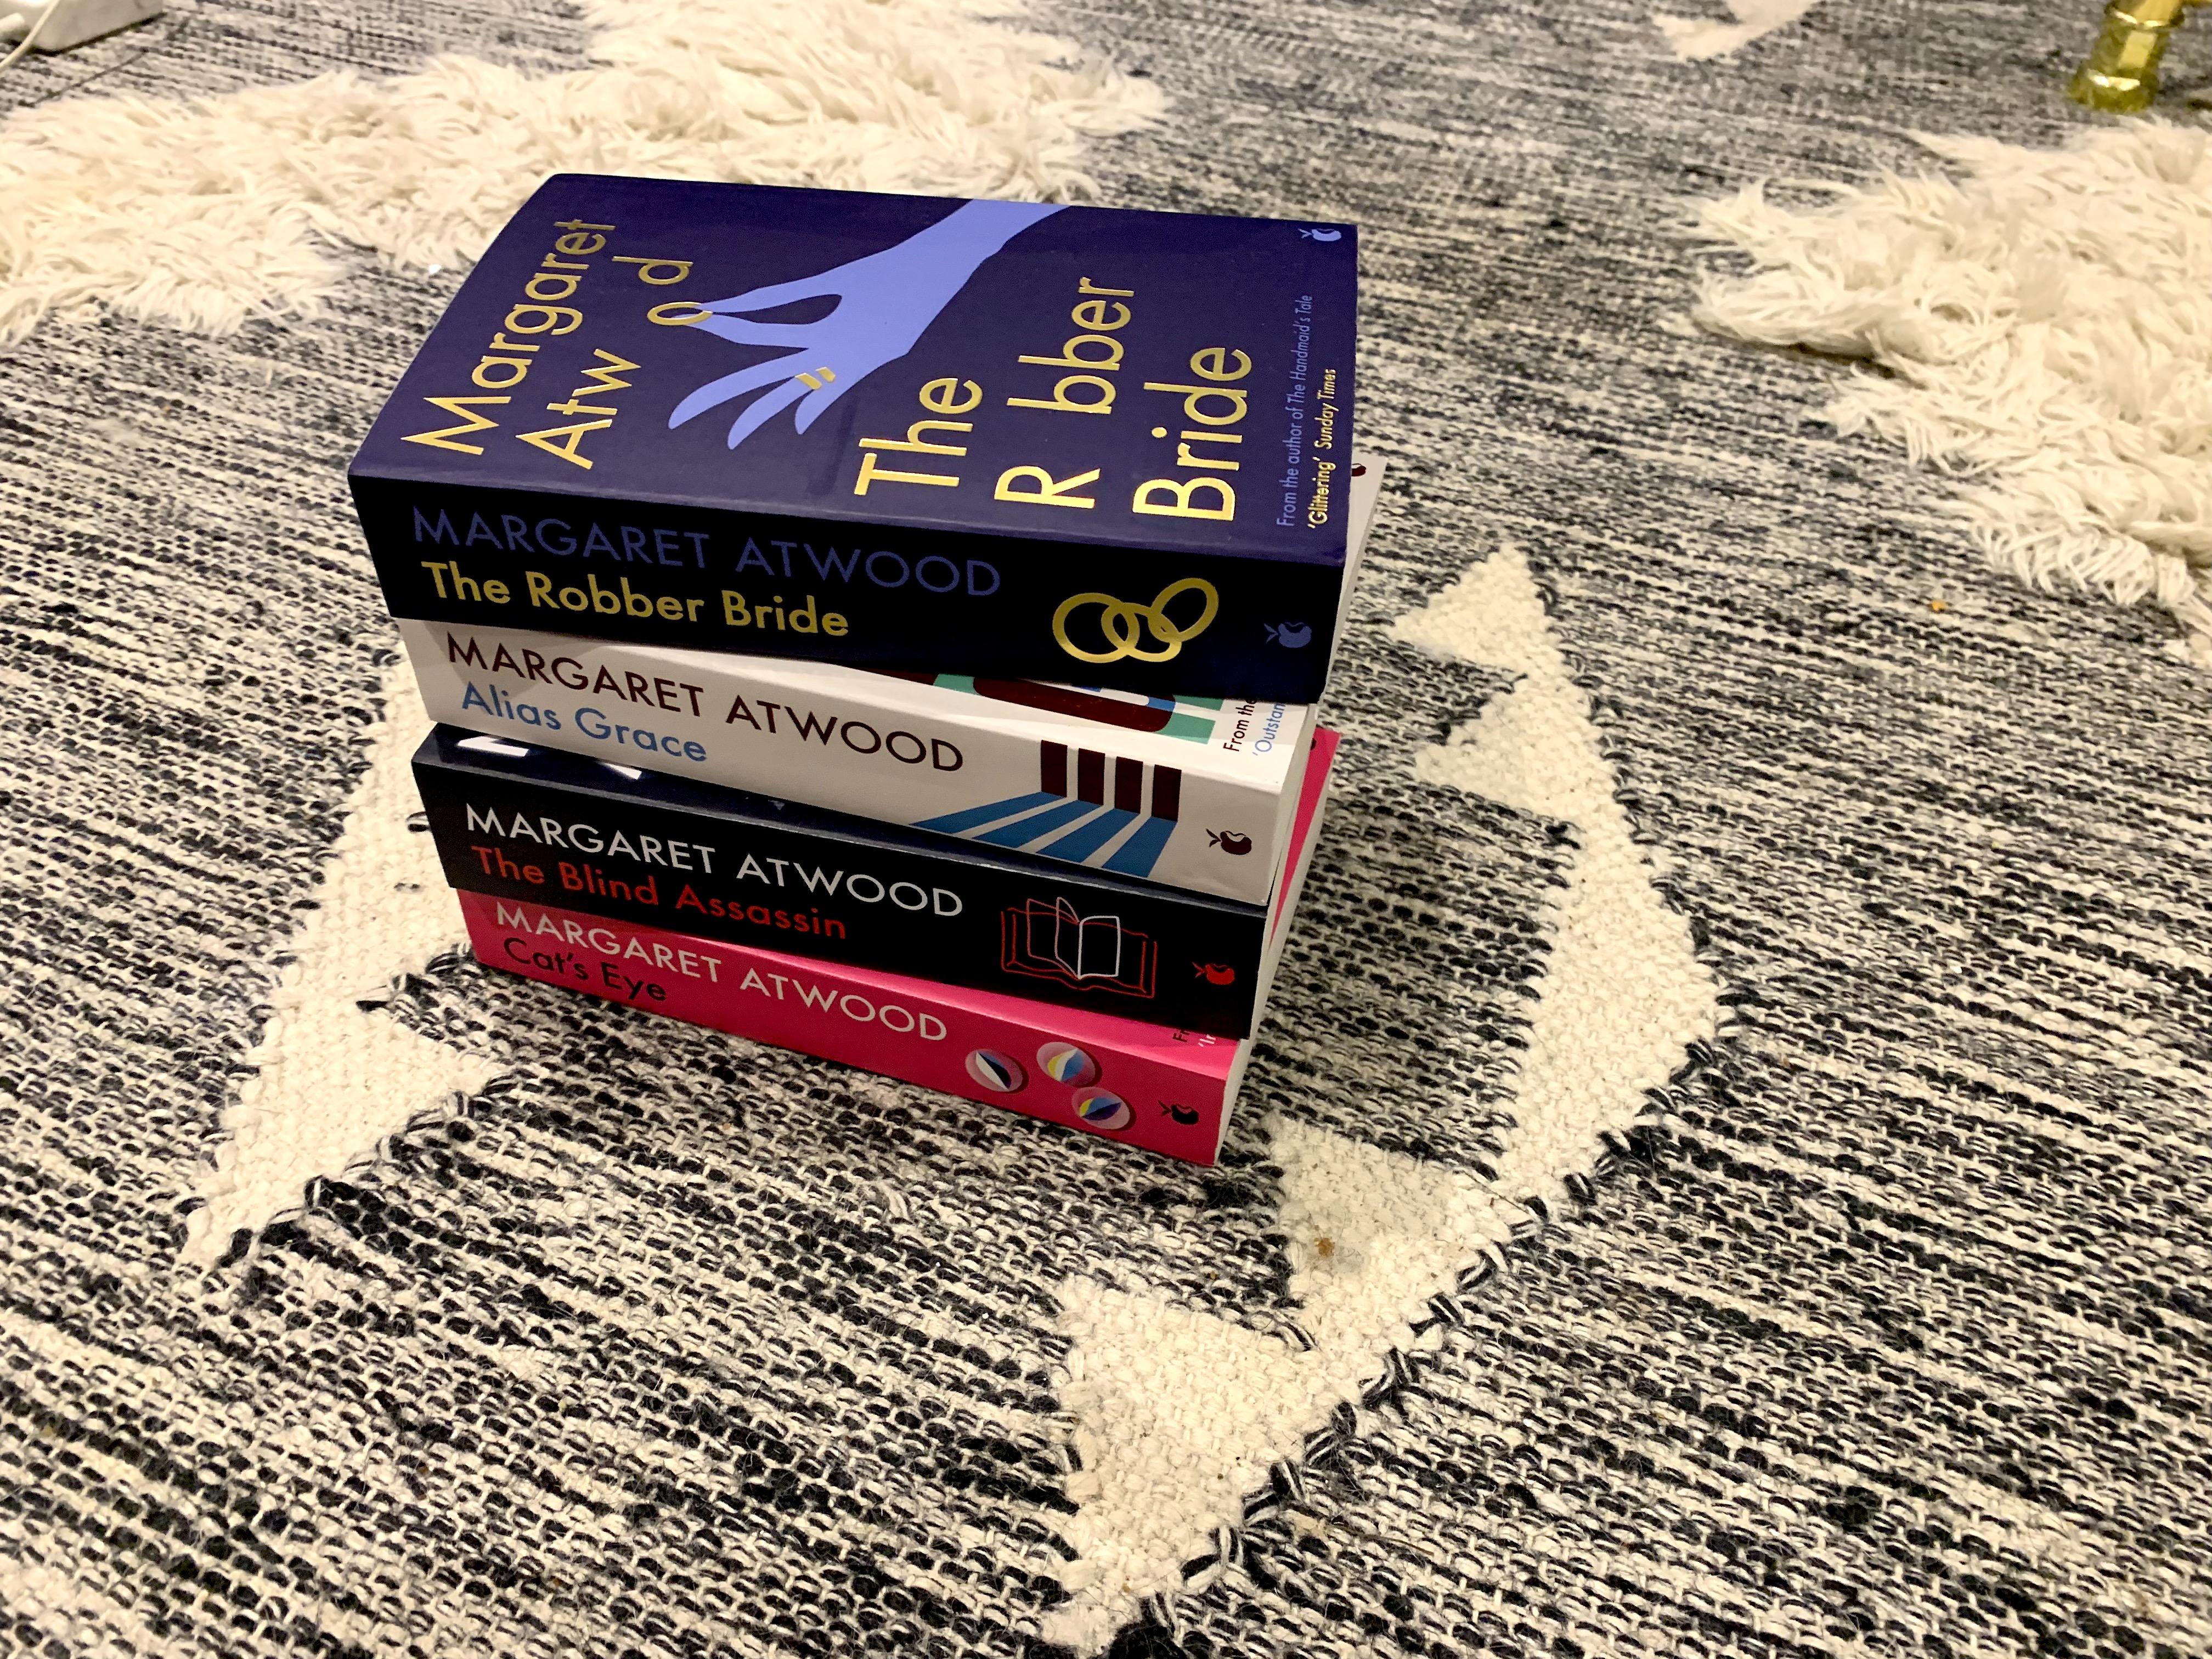 Photo of Margaret Atwood books